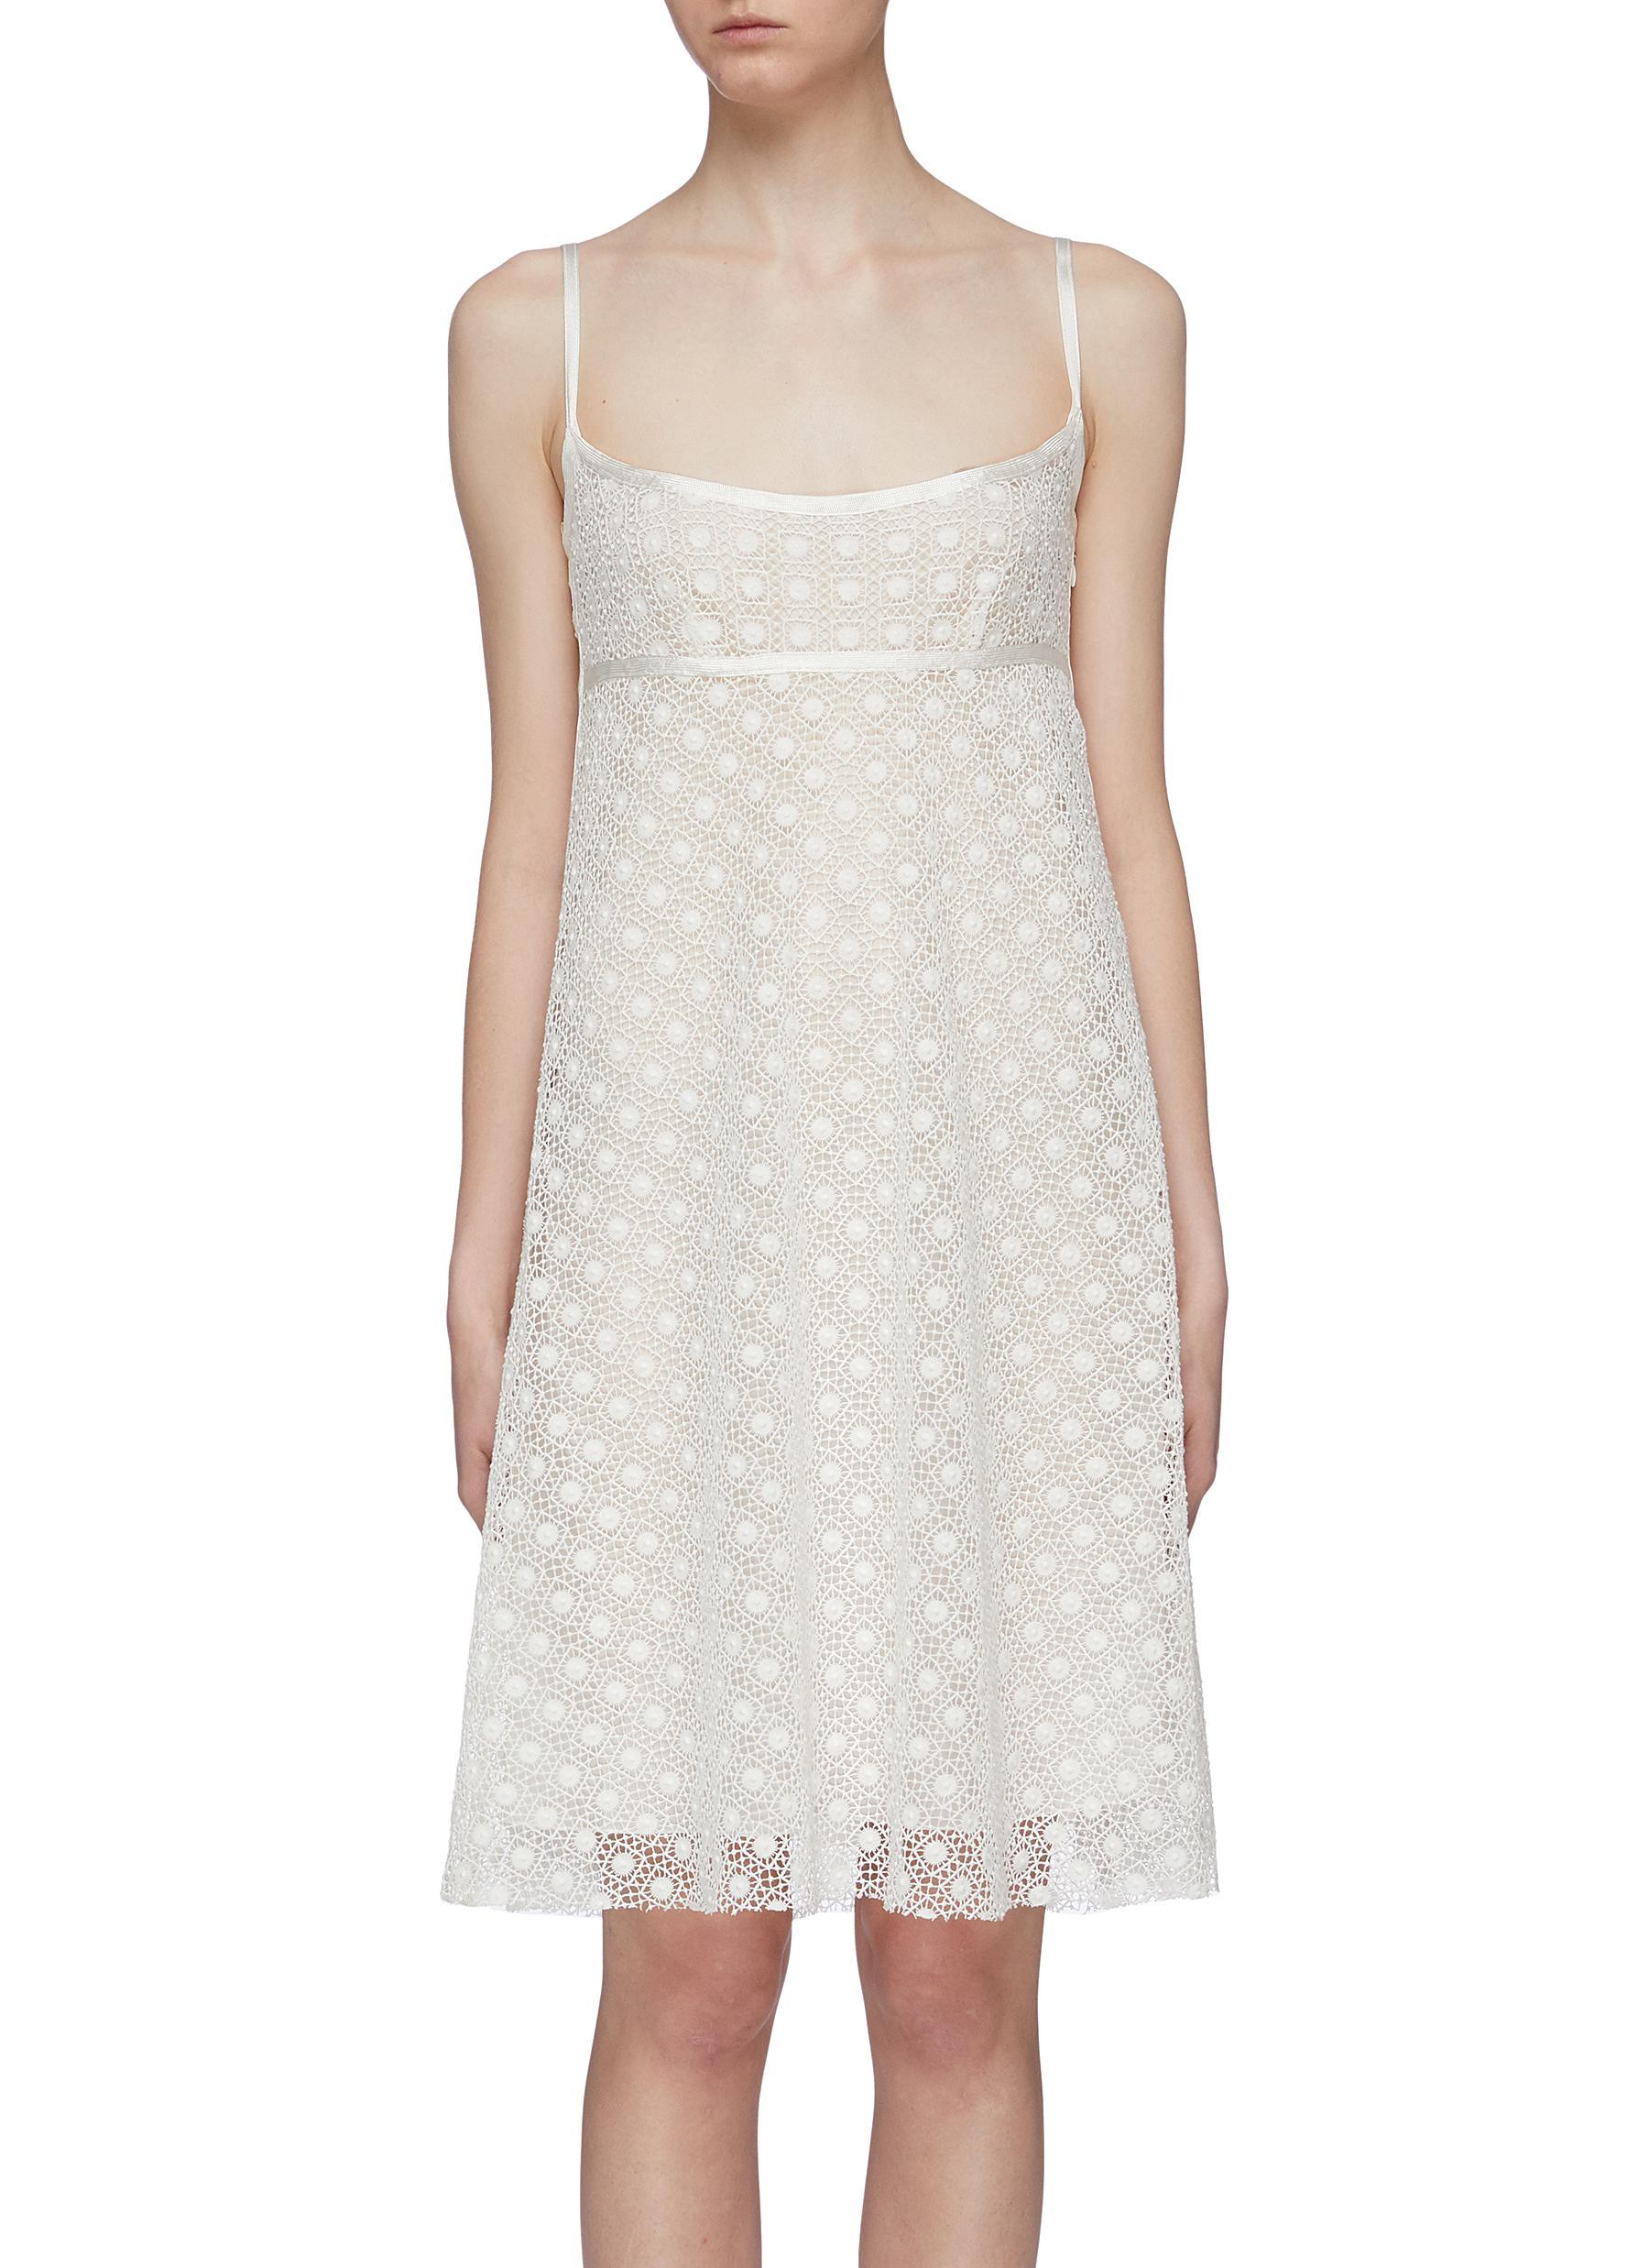 Marc Jacobs Dresses Geometric crochet lace empire waist slip dress